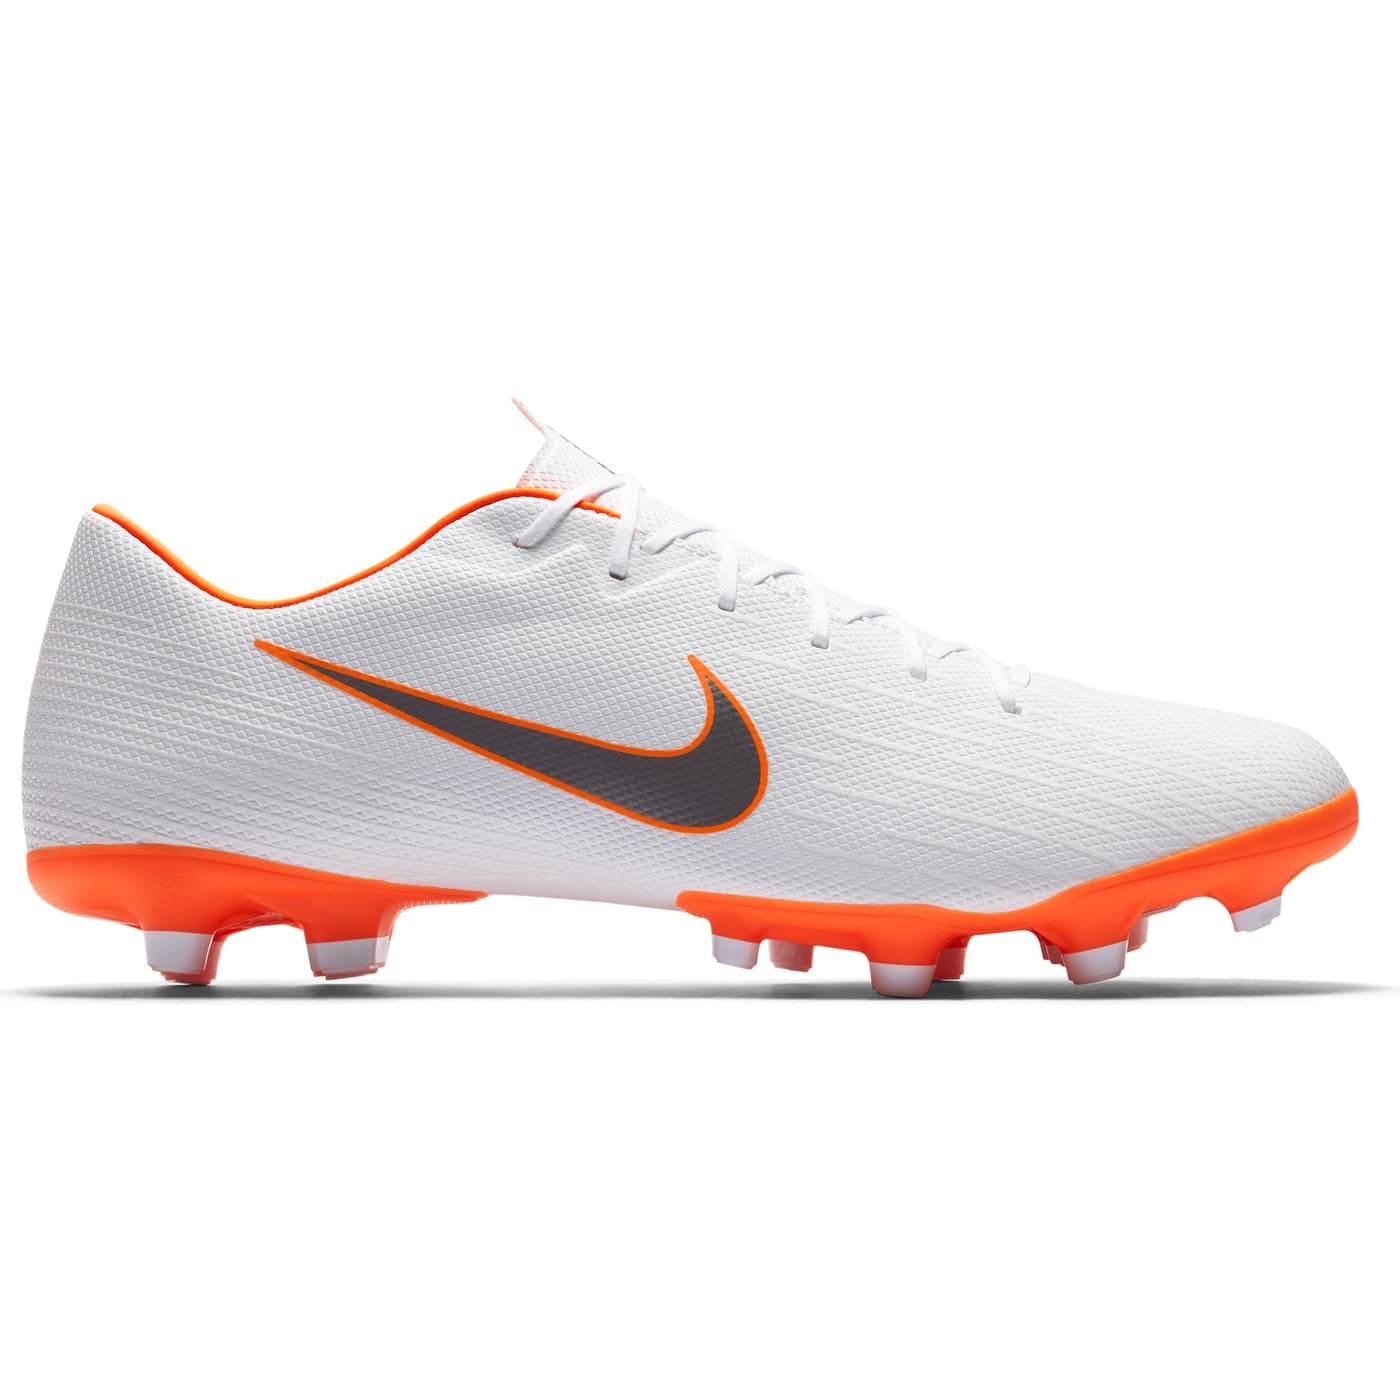 new products 52c17 71cd9 nike vapor football | ventes flash